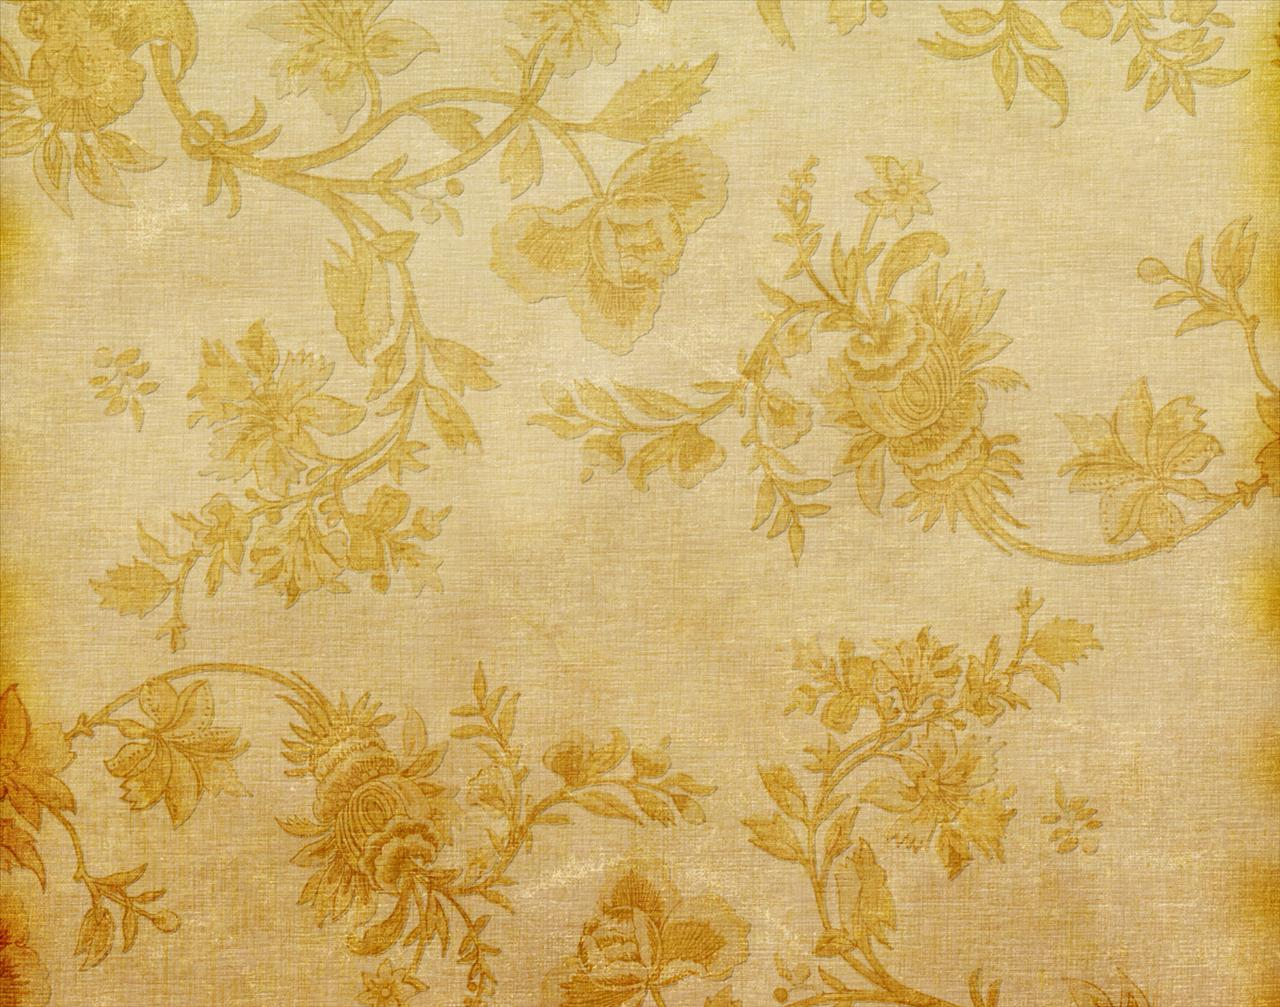 [44+] The Yellow Wallpaper Date Written on WallpaperSafari